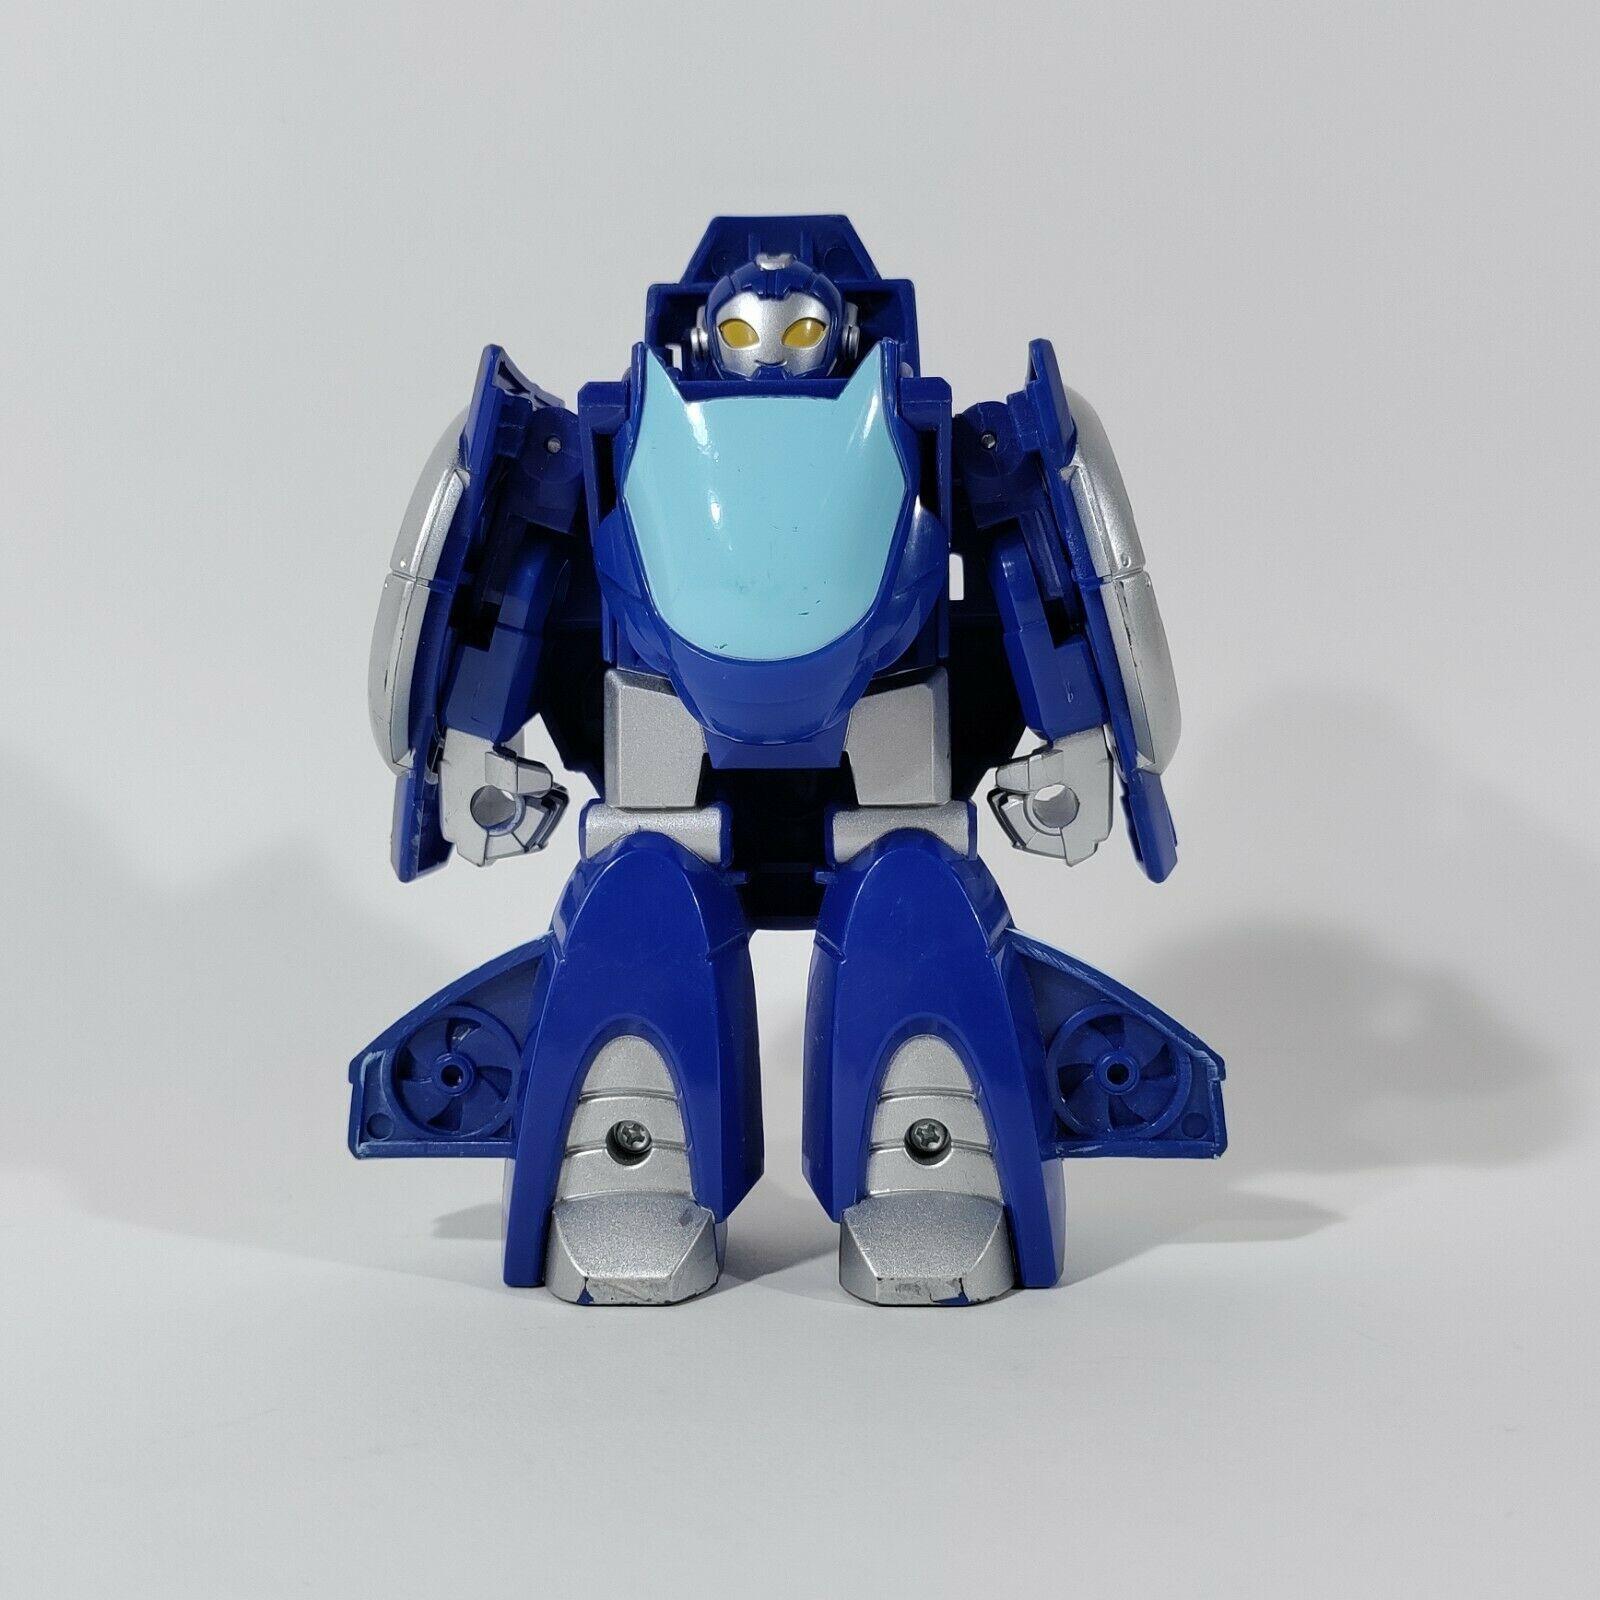 "Transformers Rescue Bots Hasbro Tomy 6"" Figurine - $9.50"